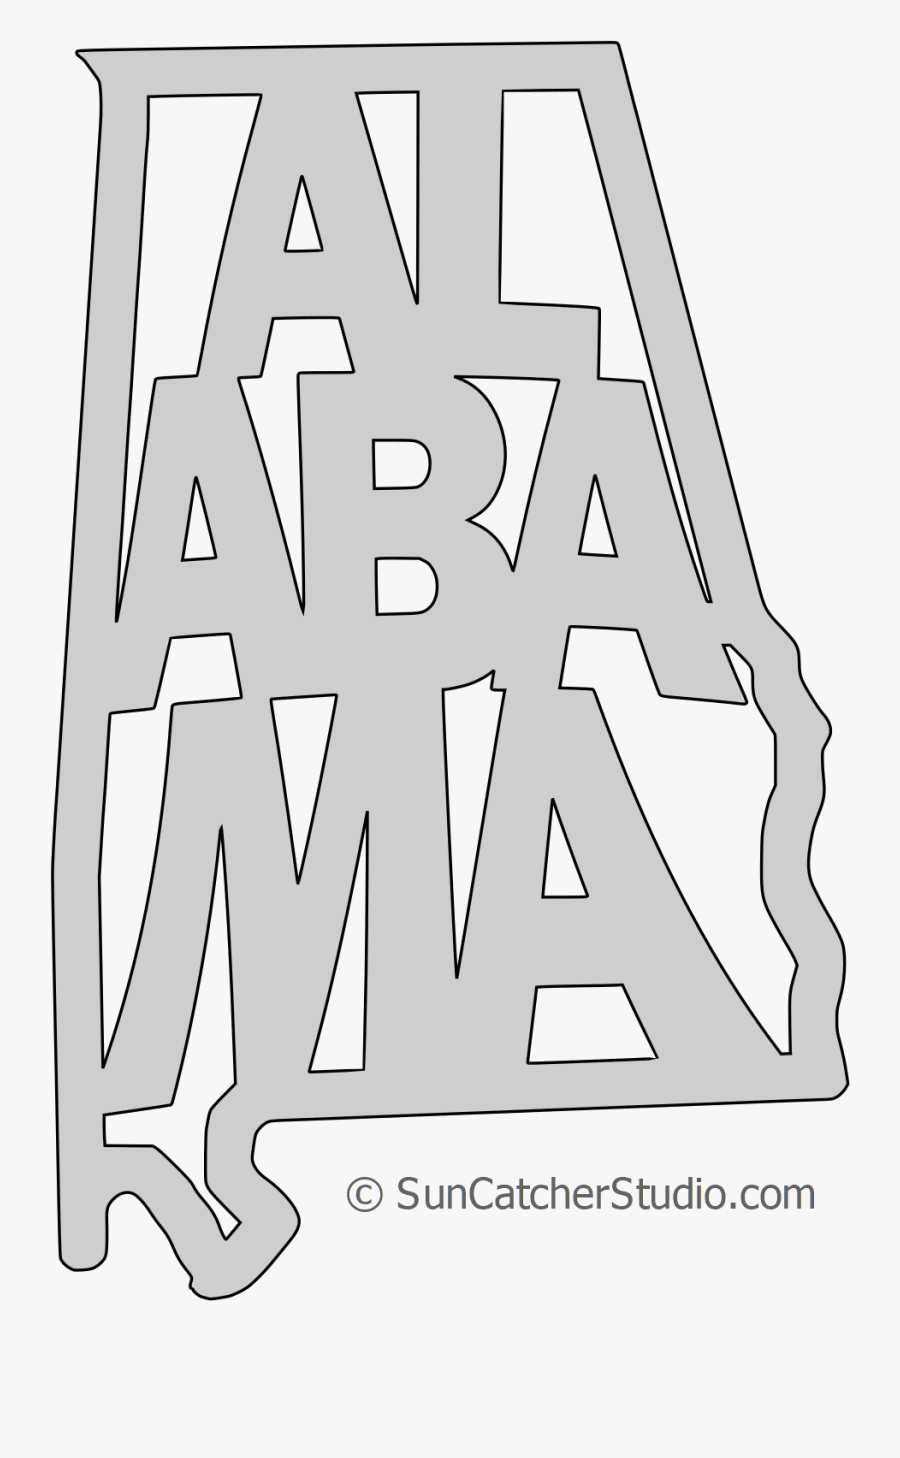 Transparent State Alabama Outline , Free Transparent Clipart.